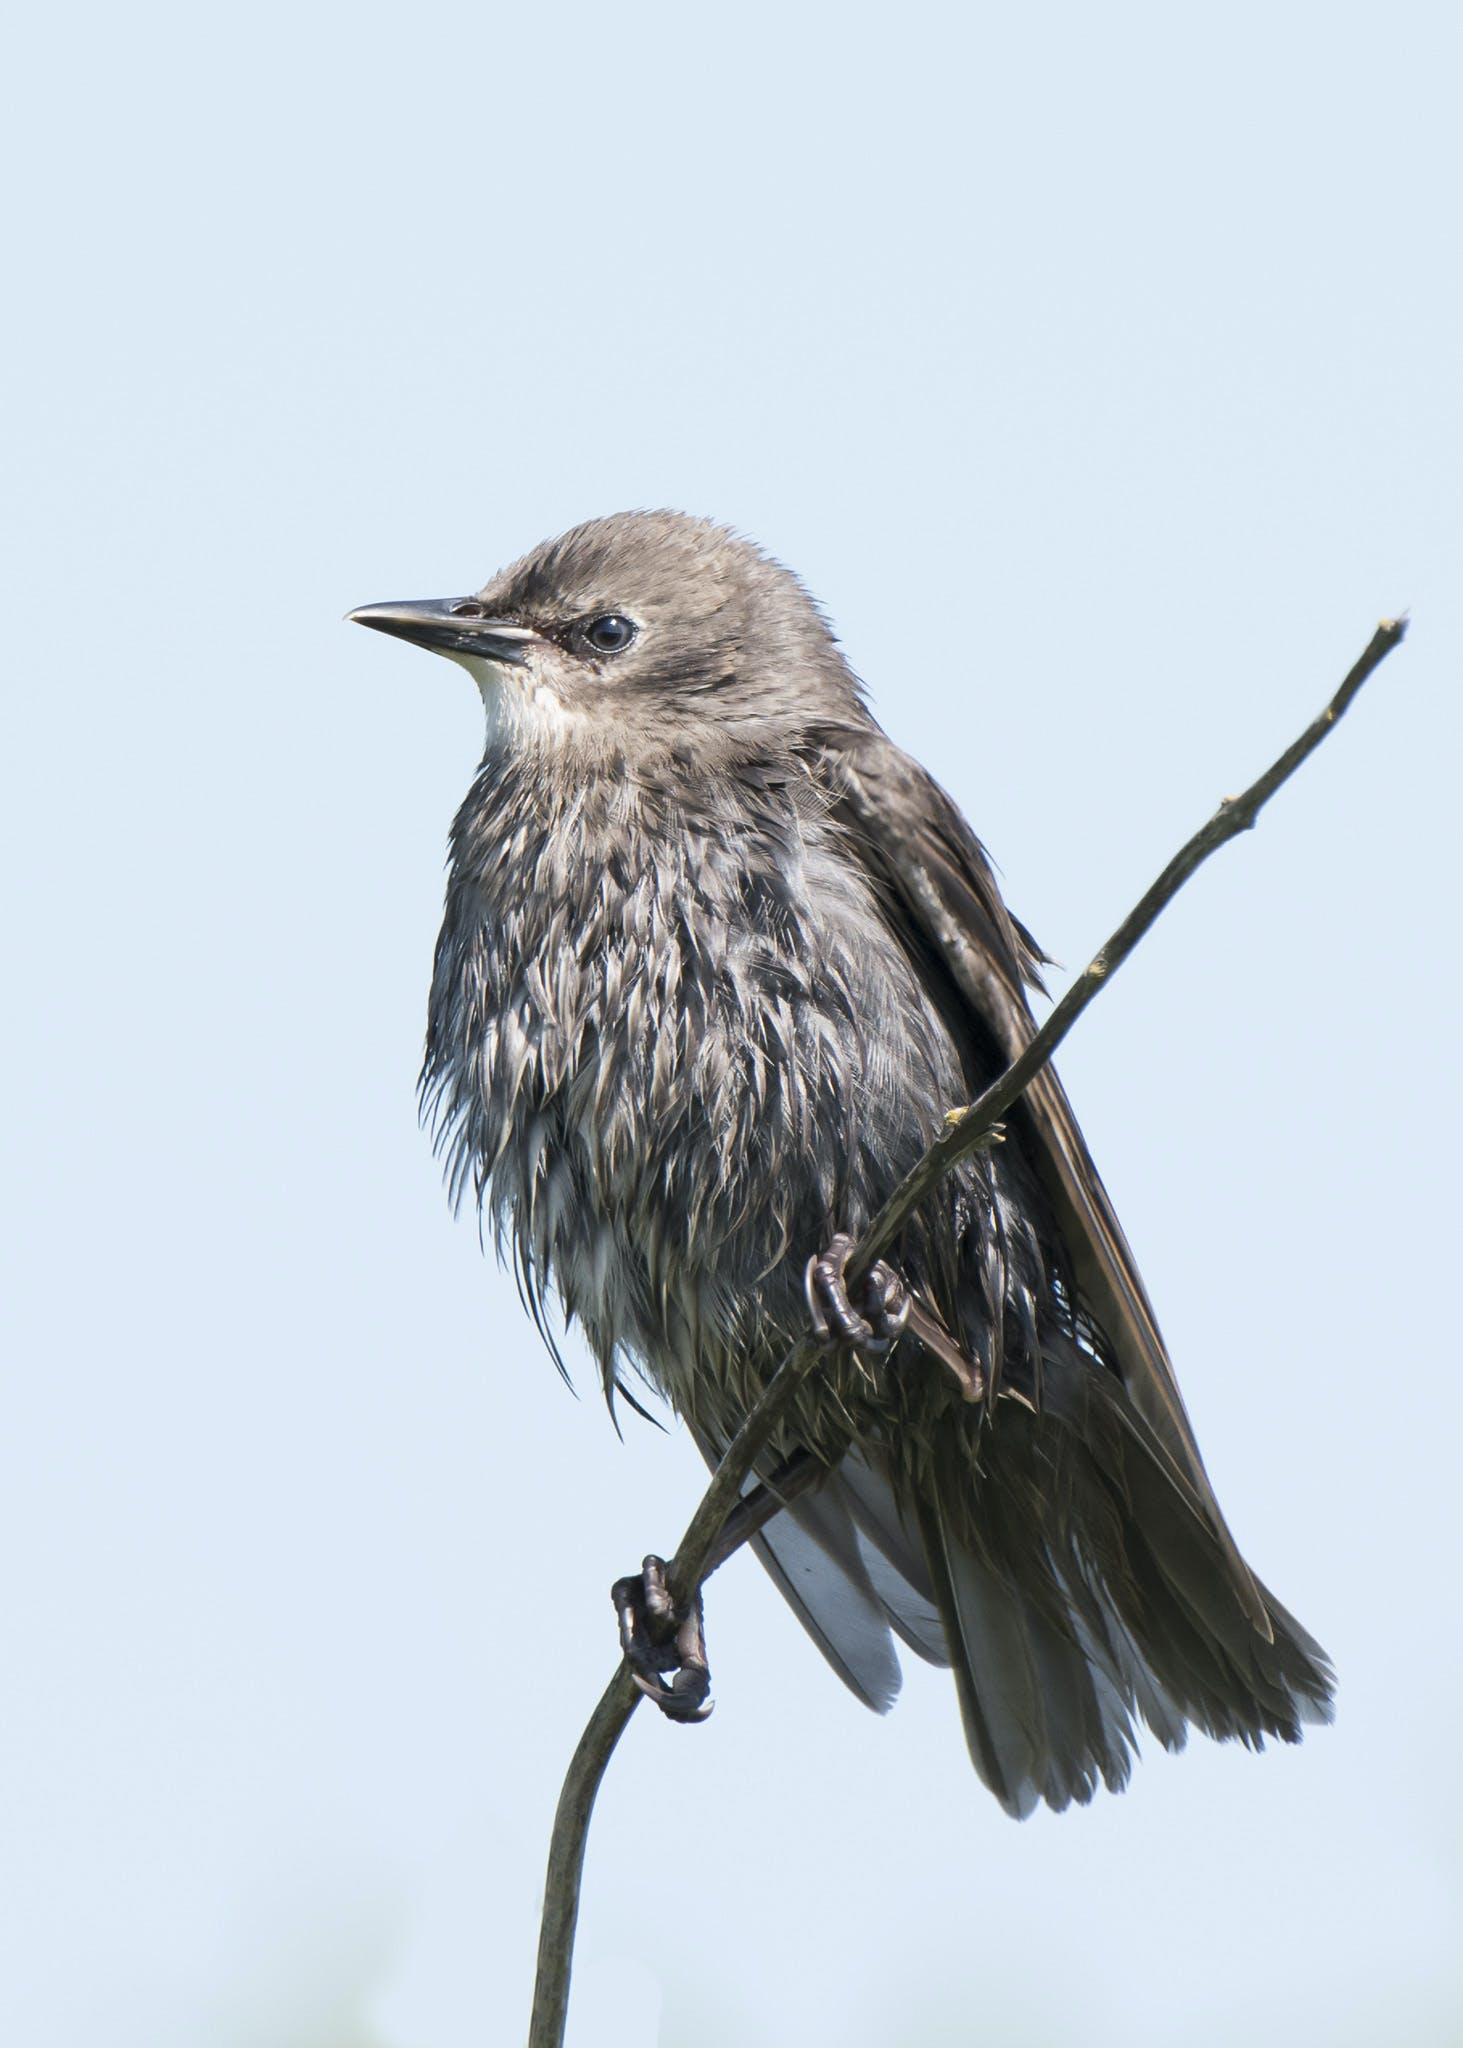 Black and Gray Bird on Tree Brunch